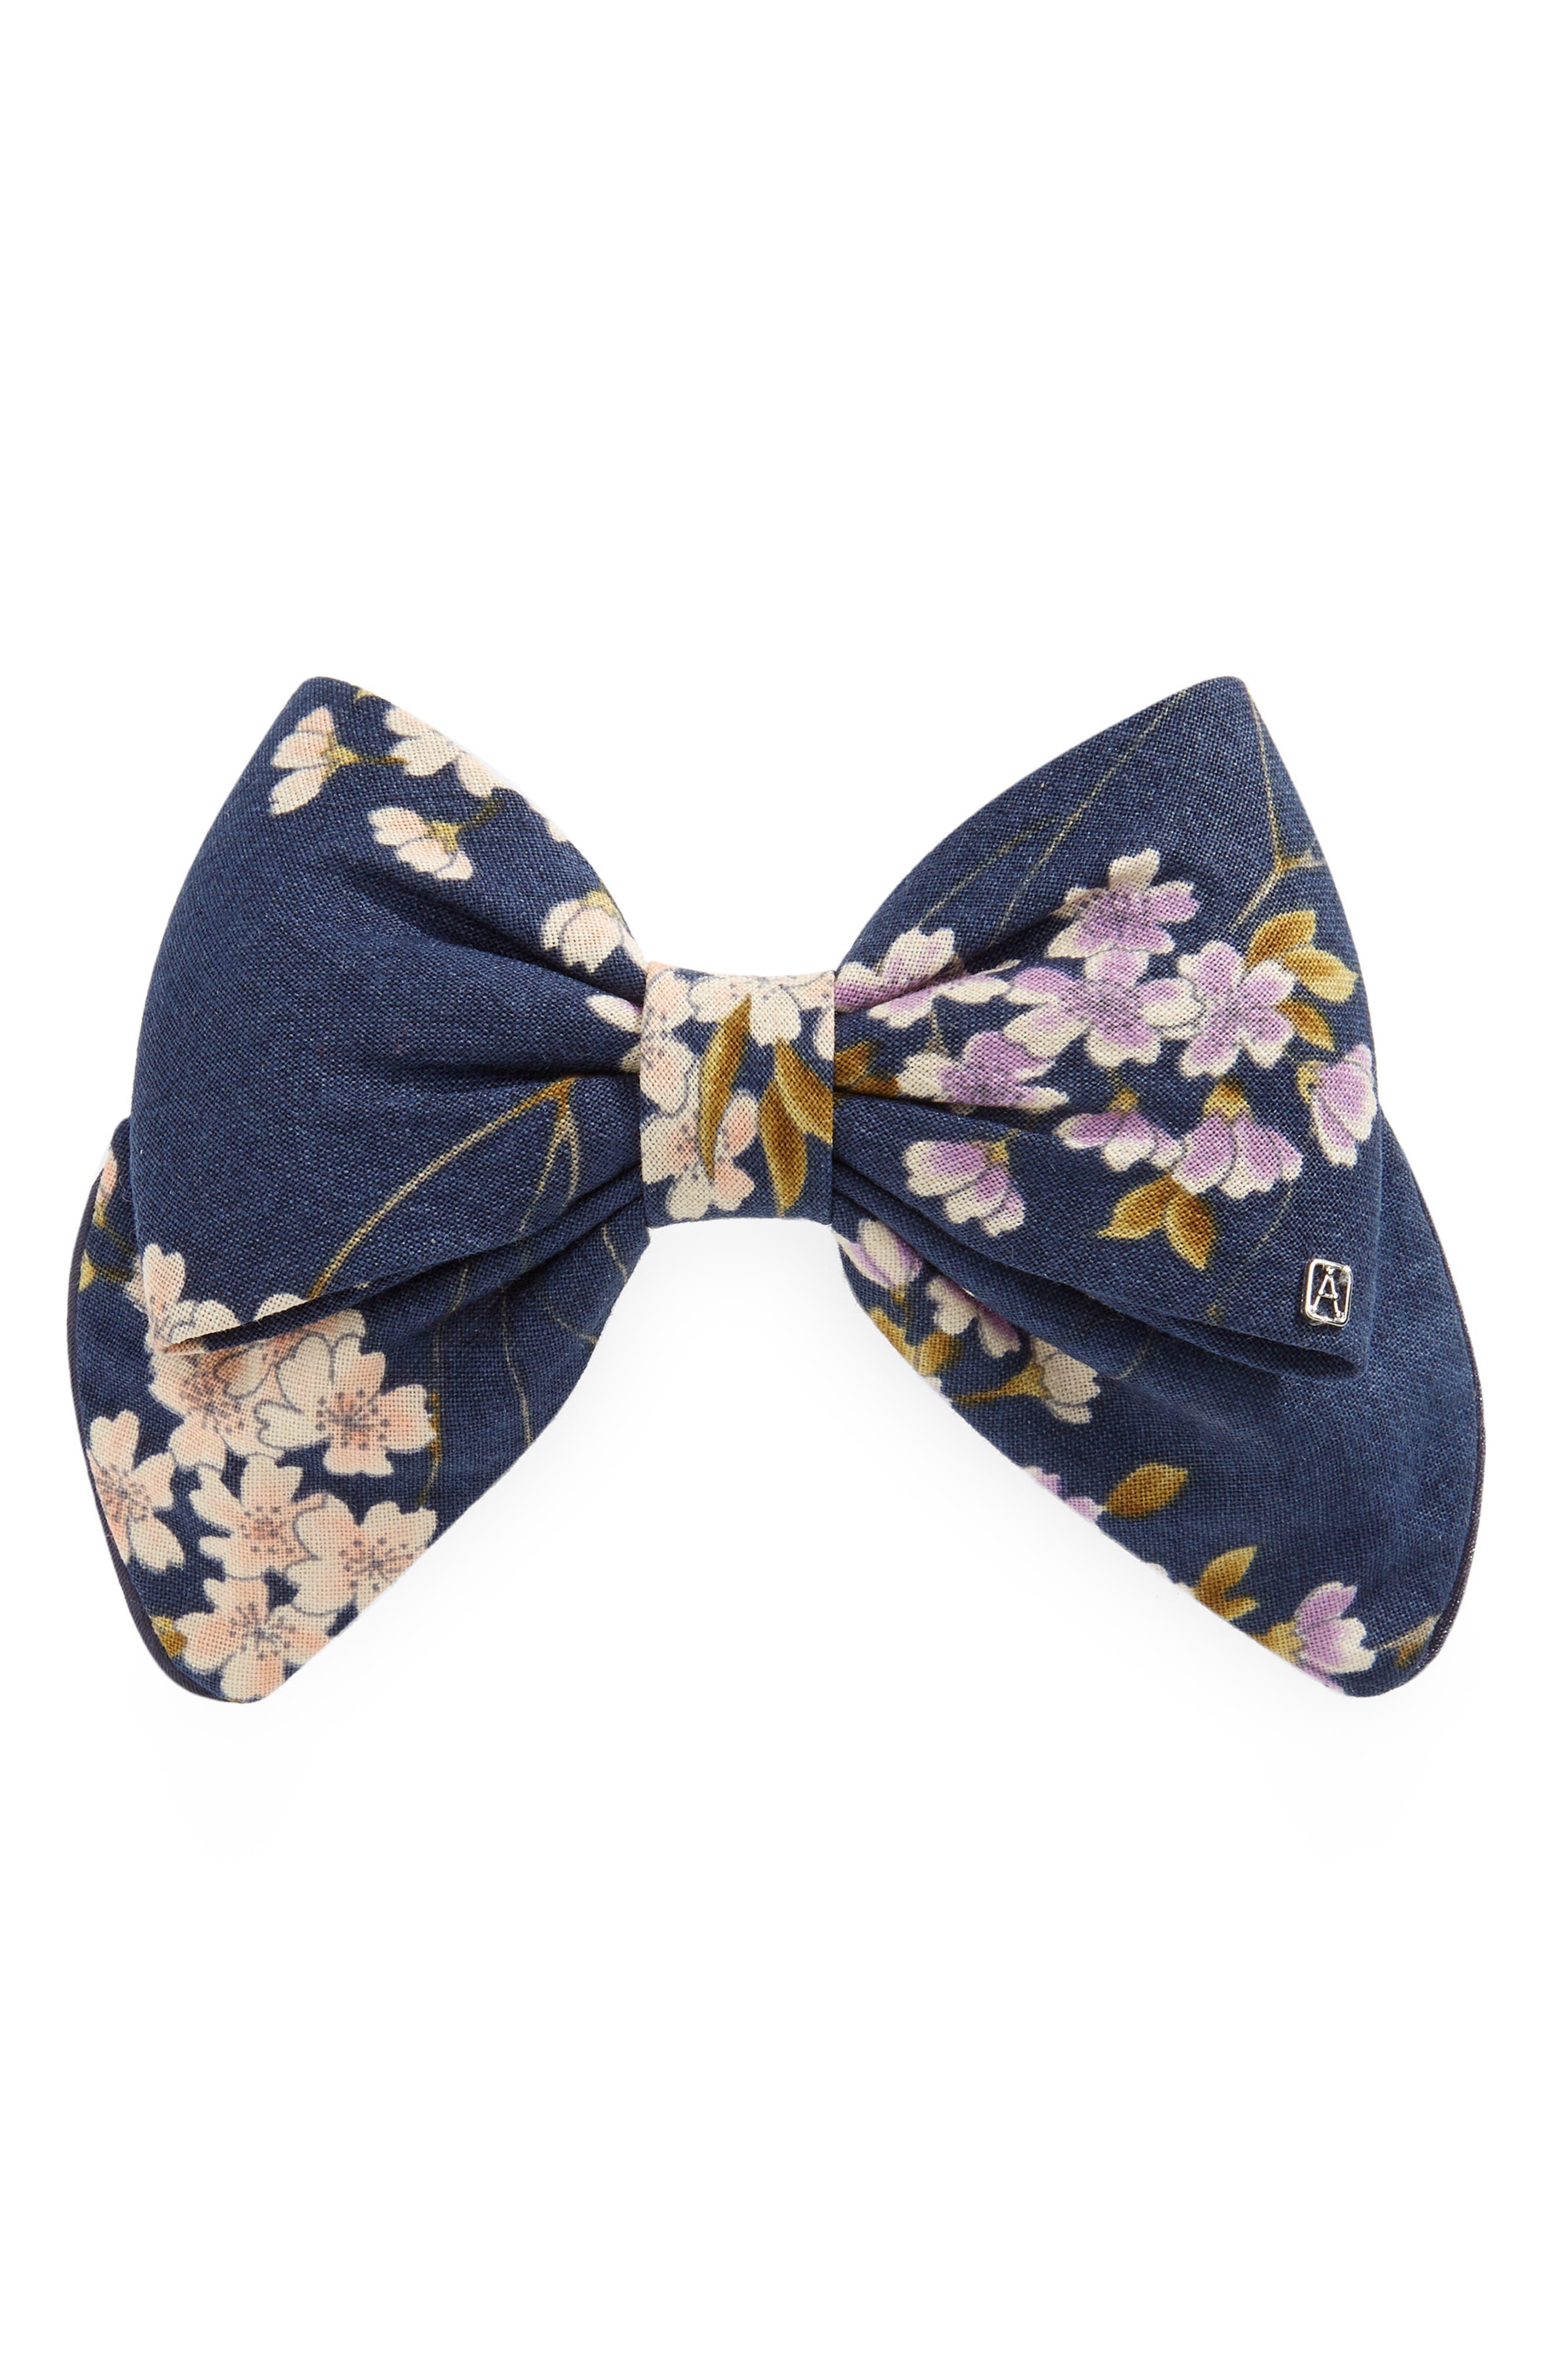 Floral Print Bow Clip